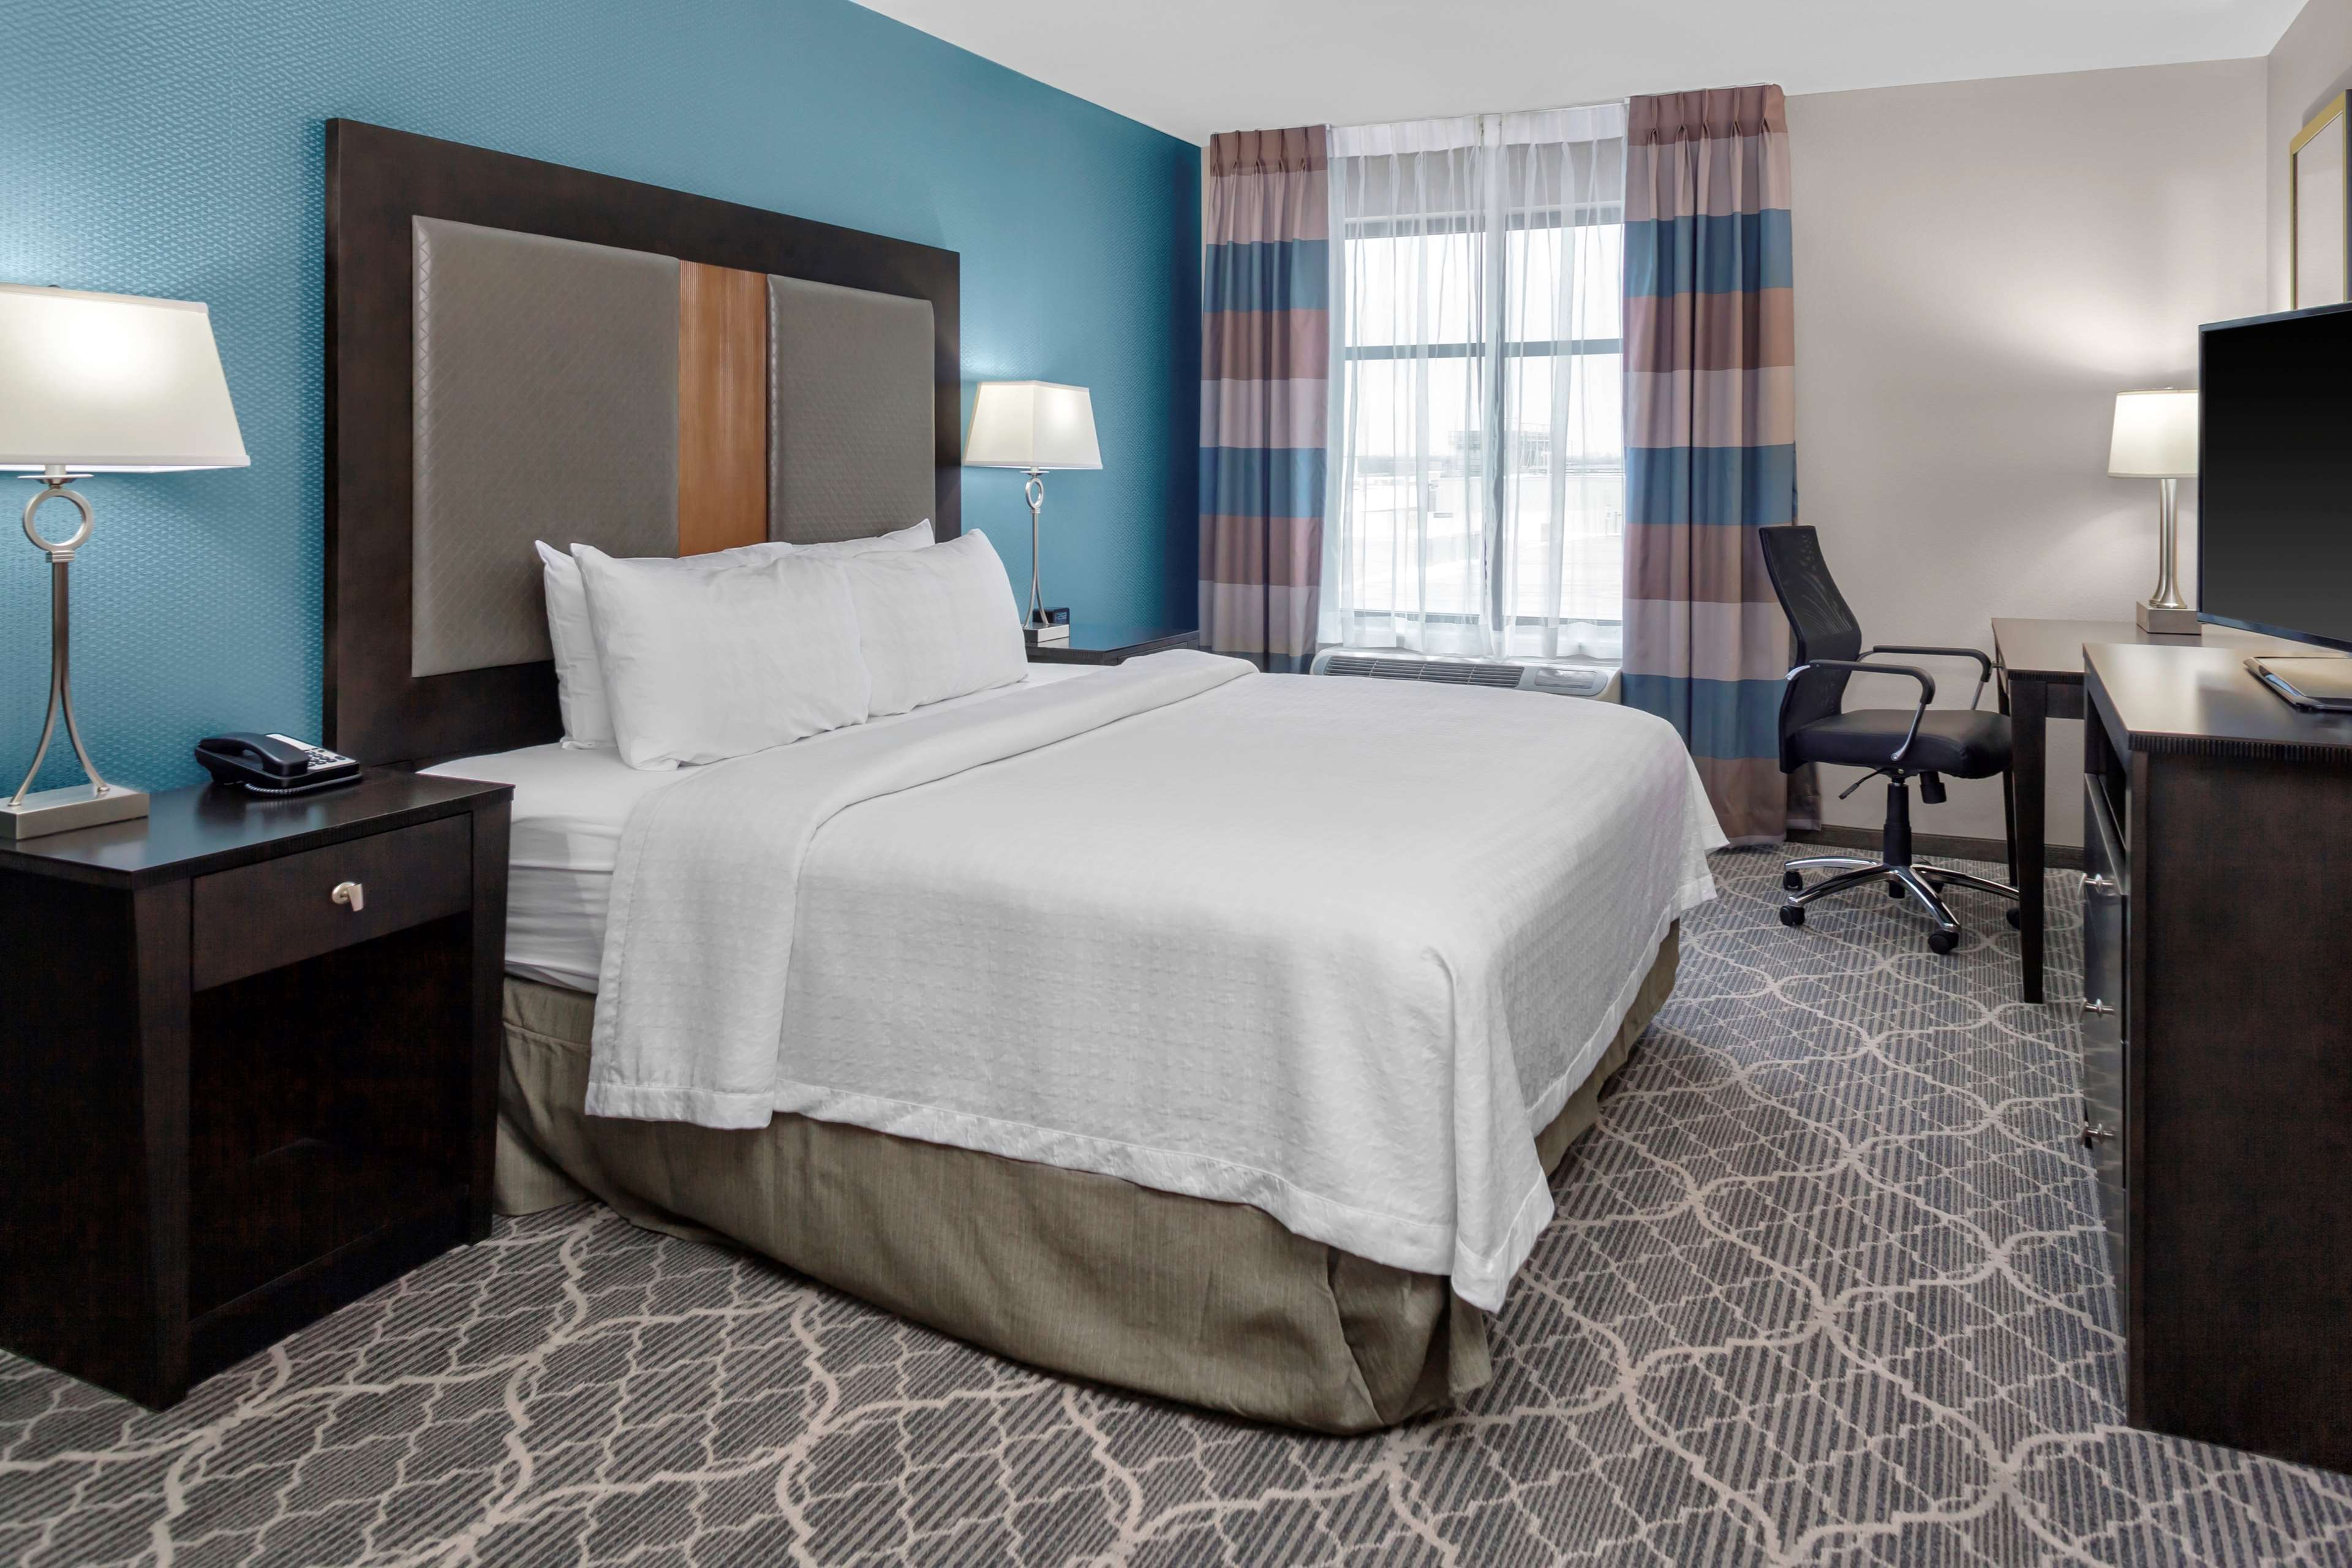 Homewood Suites by Hilton Wauwatosa Milwaukee image 14